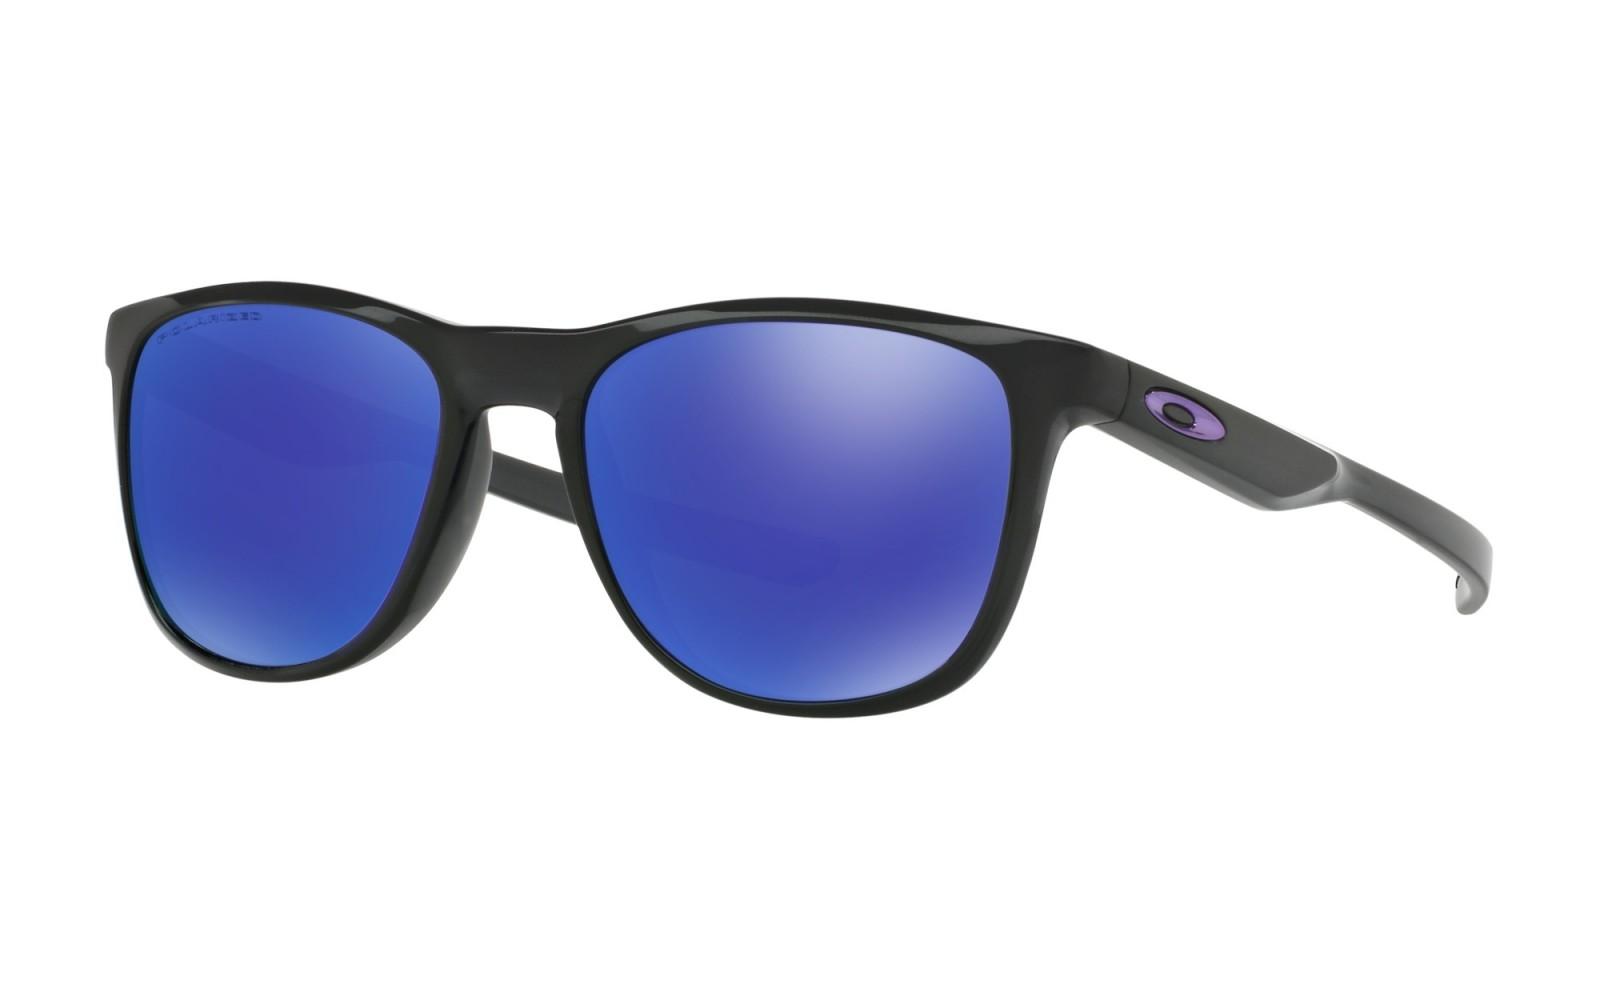 Oakley Trillbe X - Black Ink / Violet Iridium Polarized - OO9340-03 Zonnebril